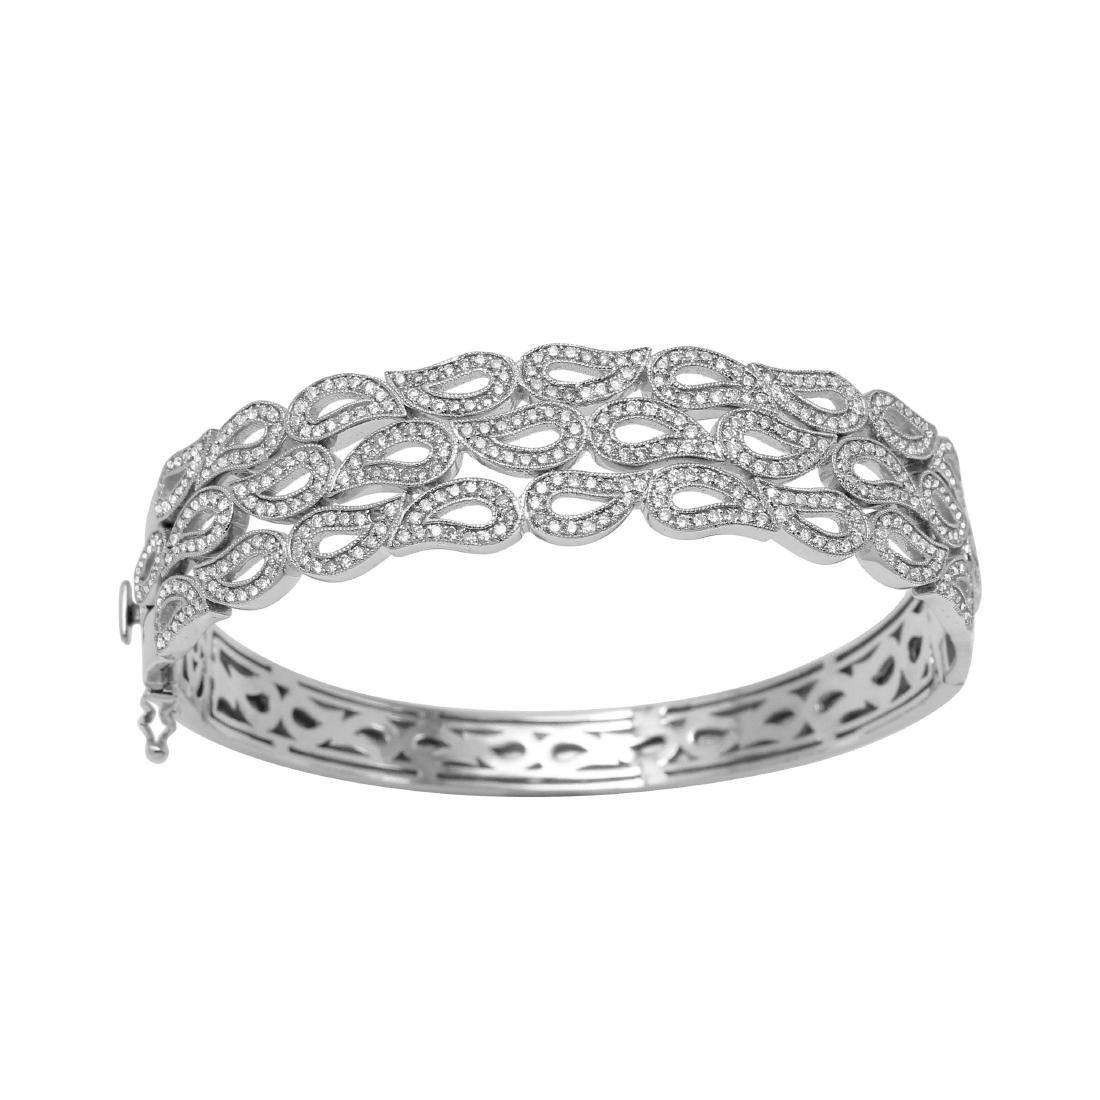 14KT White Gold Diamond Bangle Bracelet